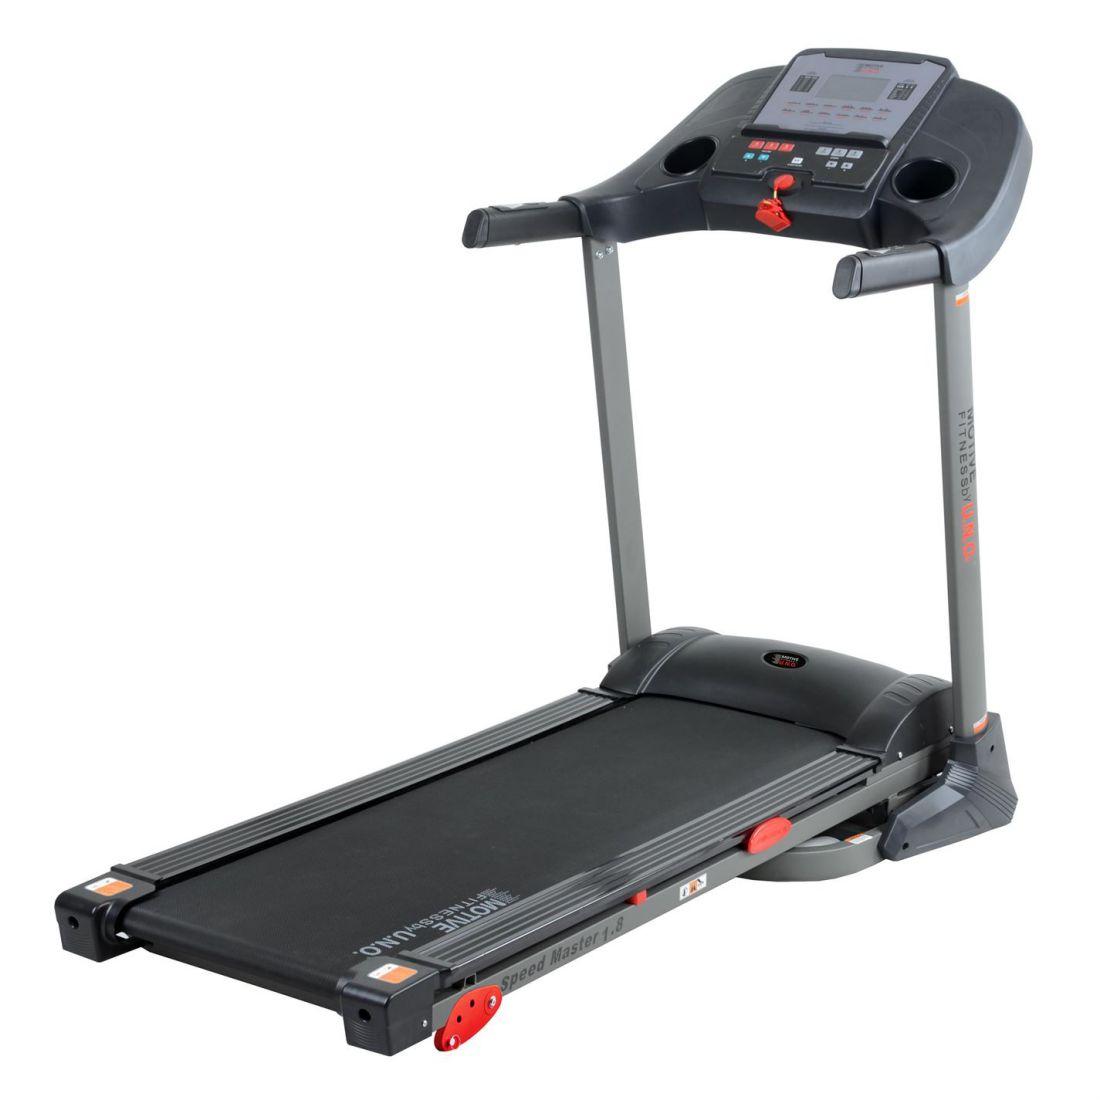 Motive Fitness Speedmaster 1.8M Programmable Manual Incline Treadmill